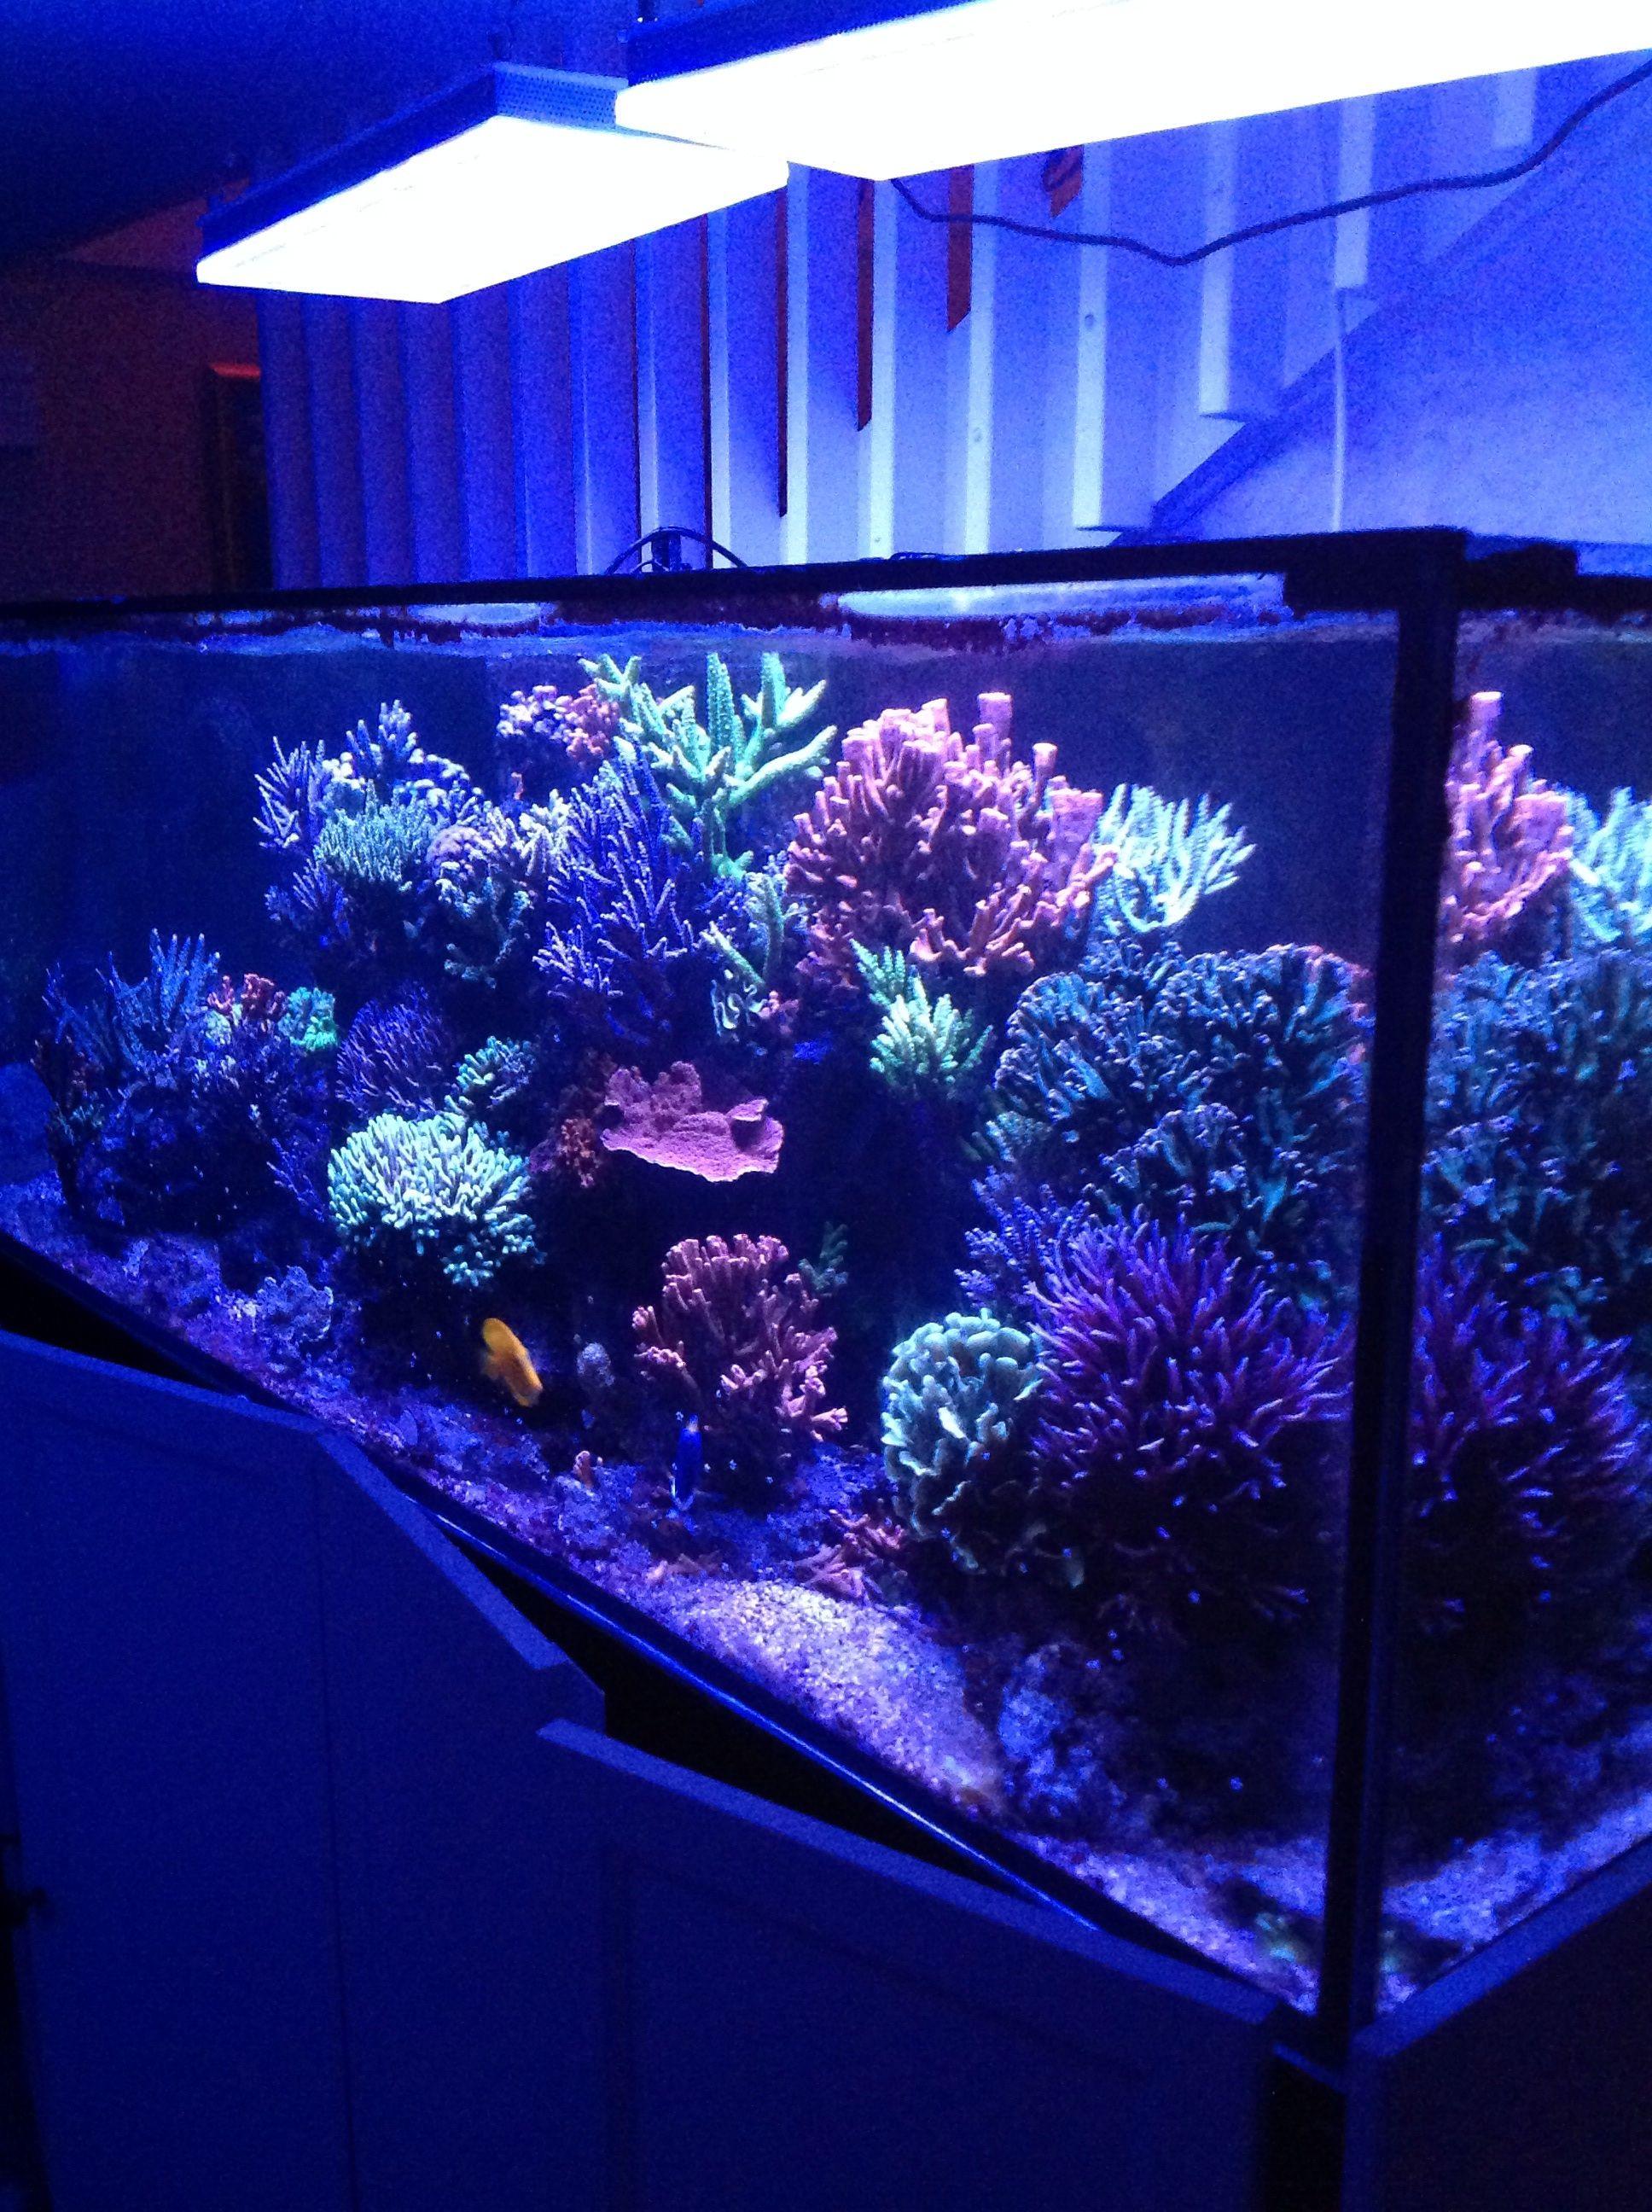 12f528da8106c4b2aa09844a67e98eea Frais De Aquarium En Bois Schème